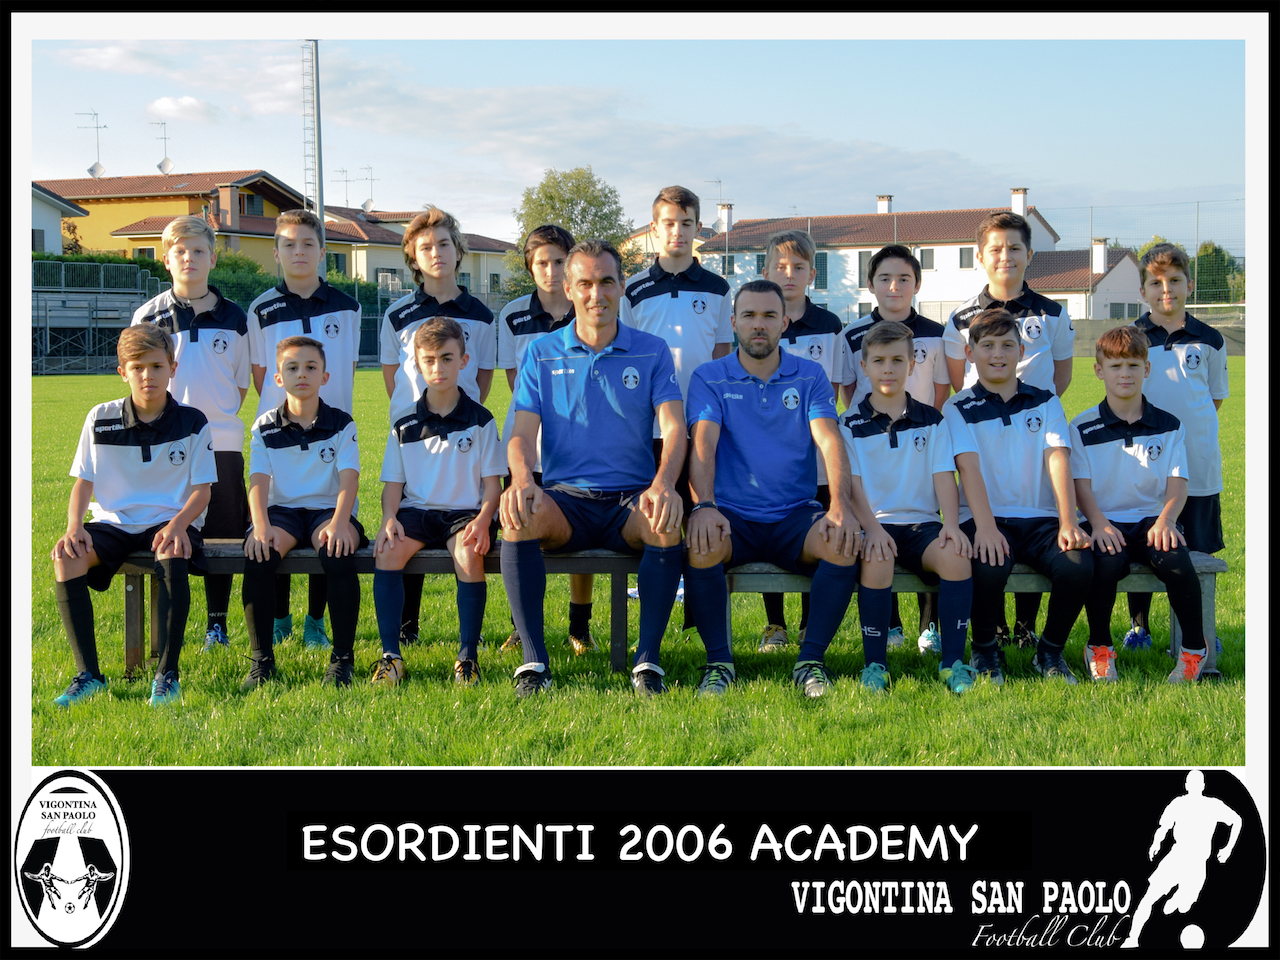 2006 Esordienti Academy